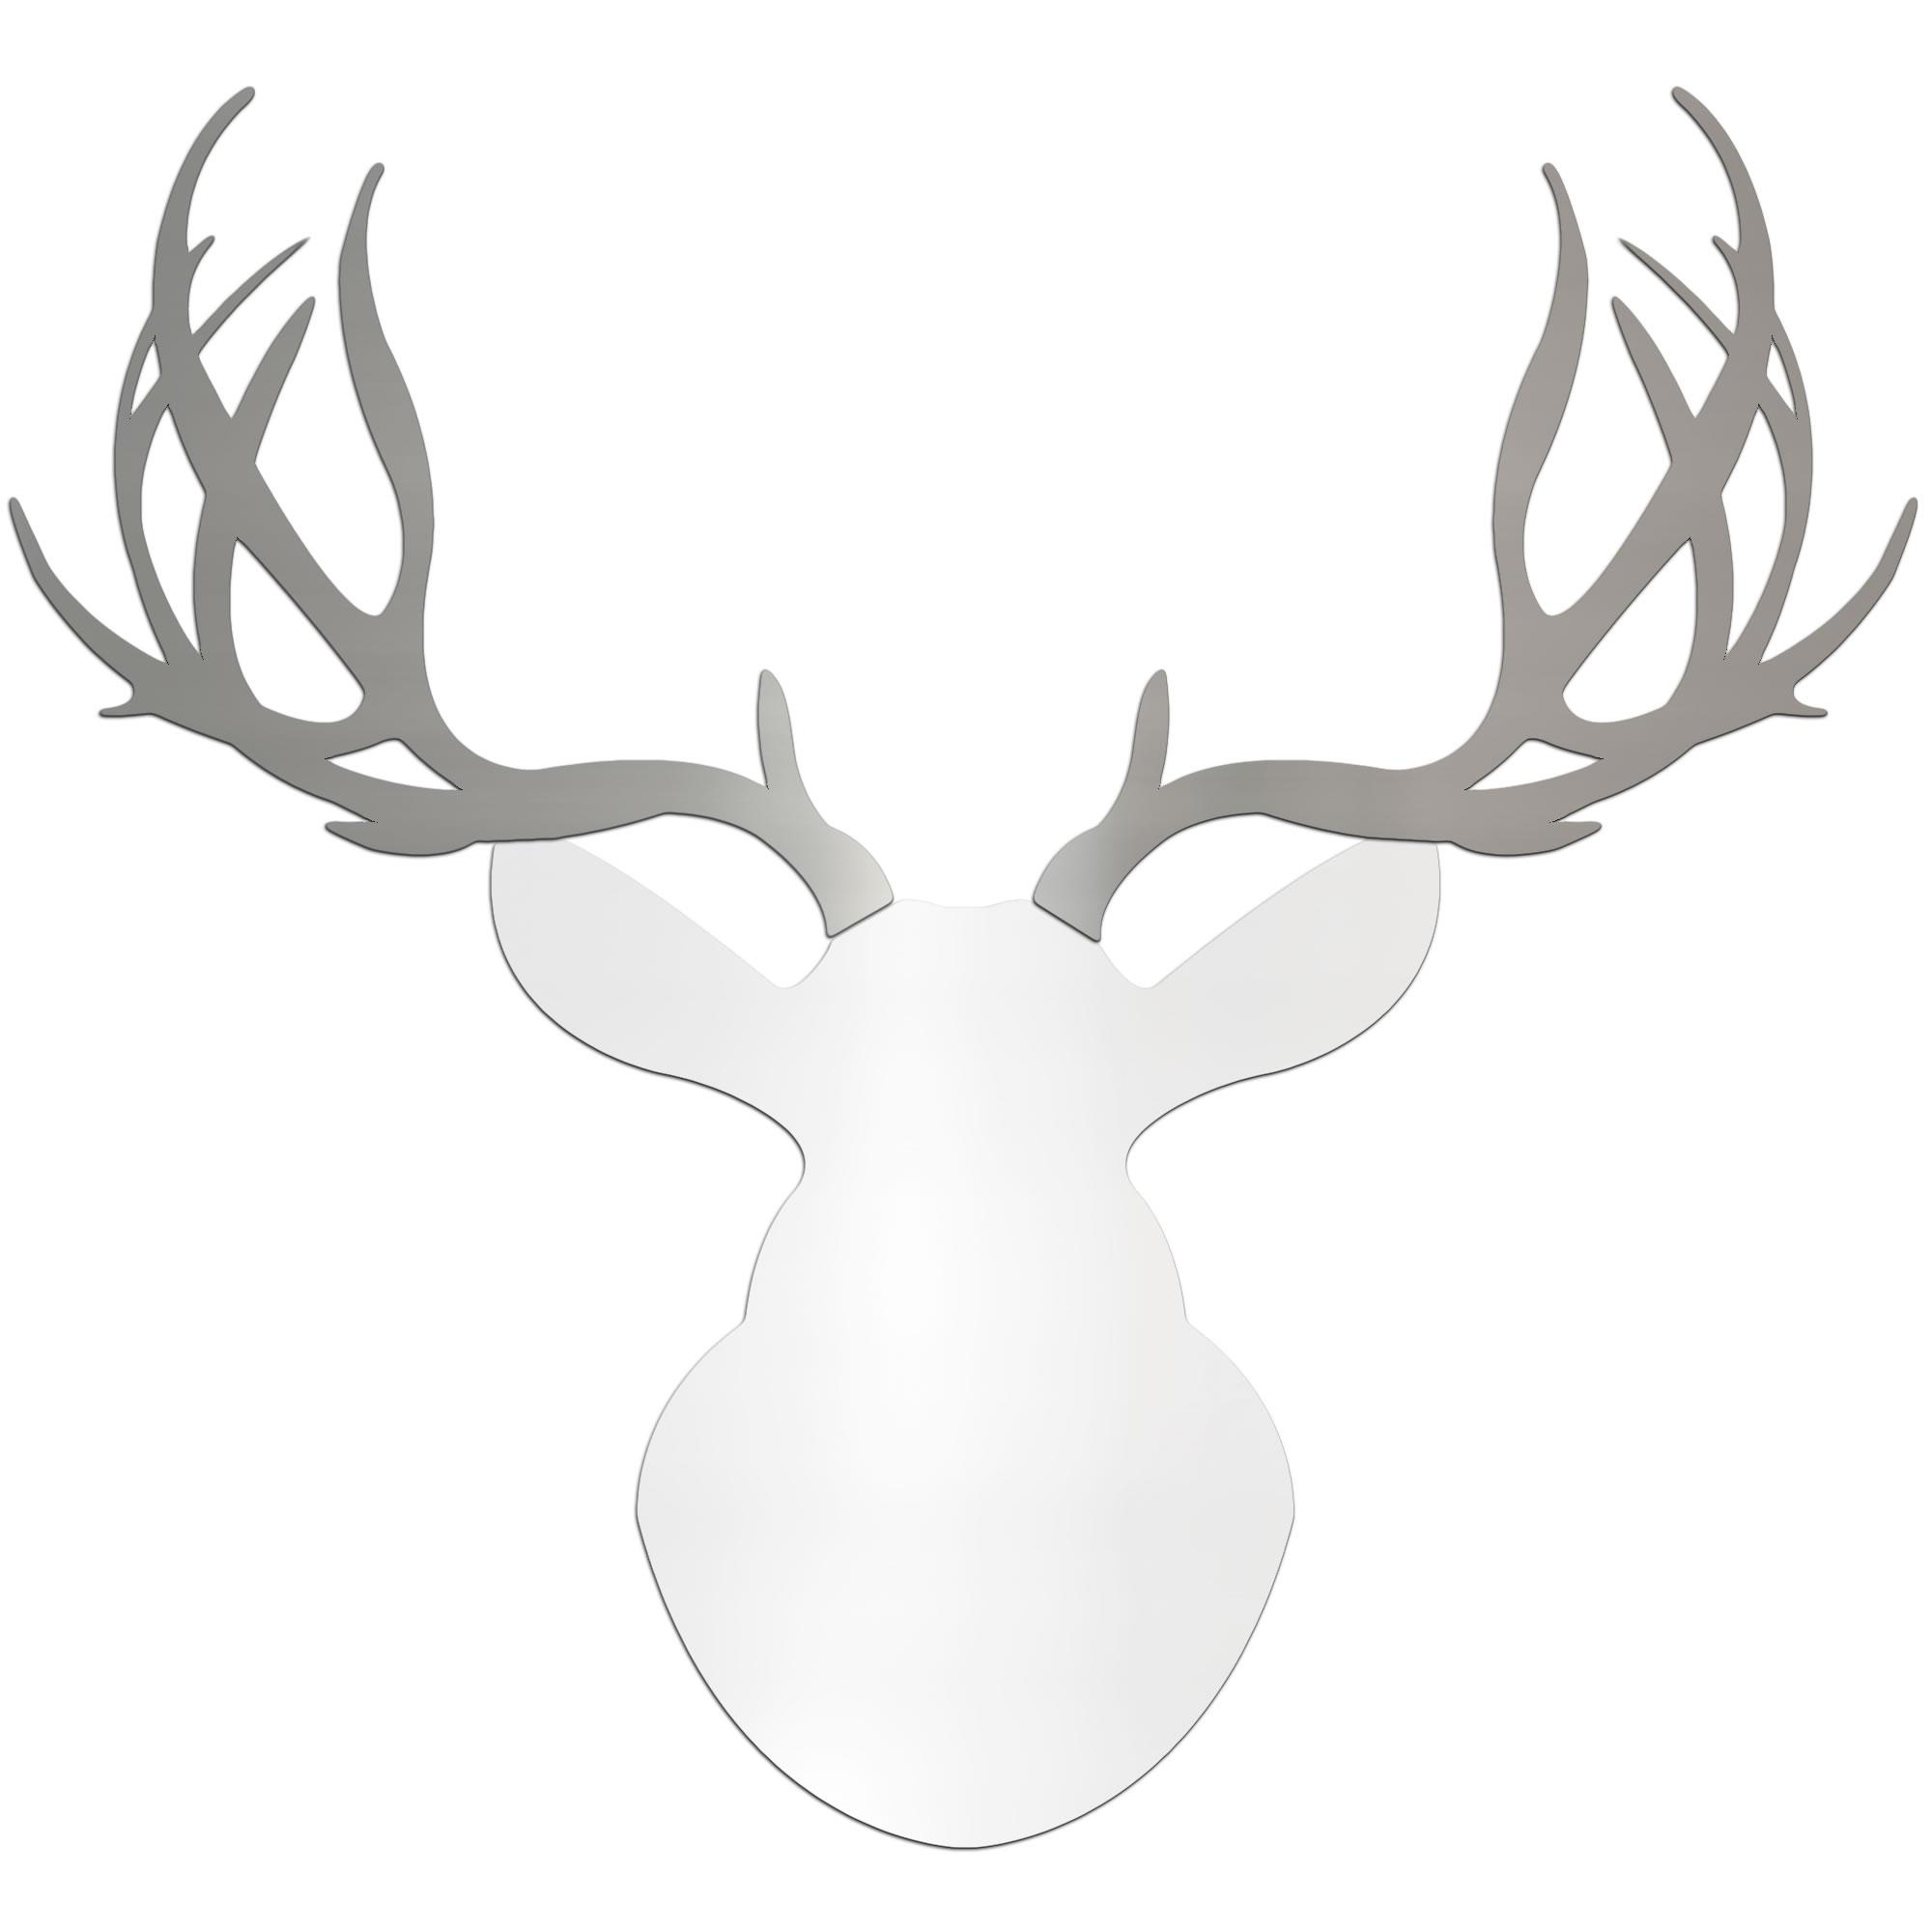 Metal Art Studio - REGAL BUCK | 36x36 in. White & Silver Deer Cut ...